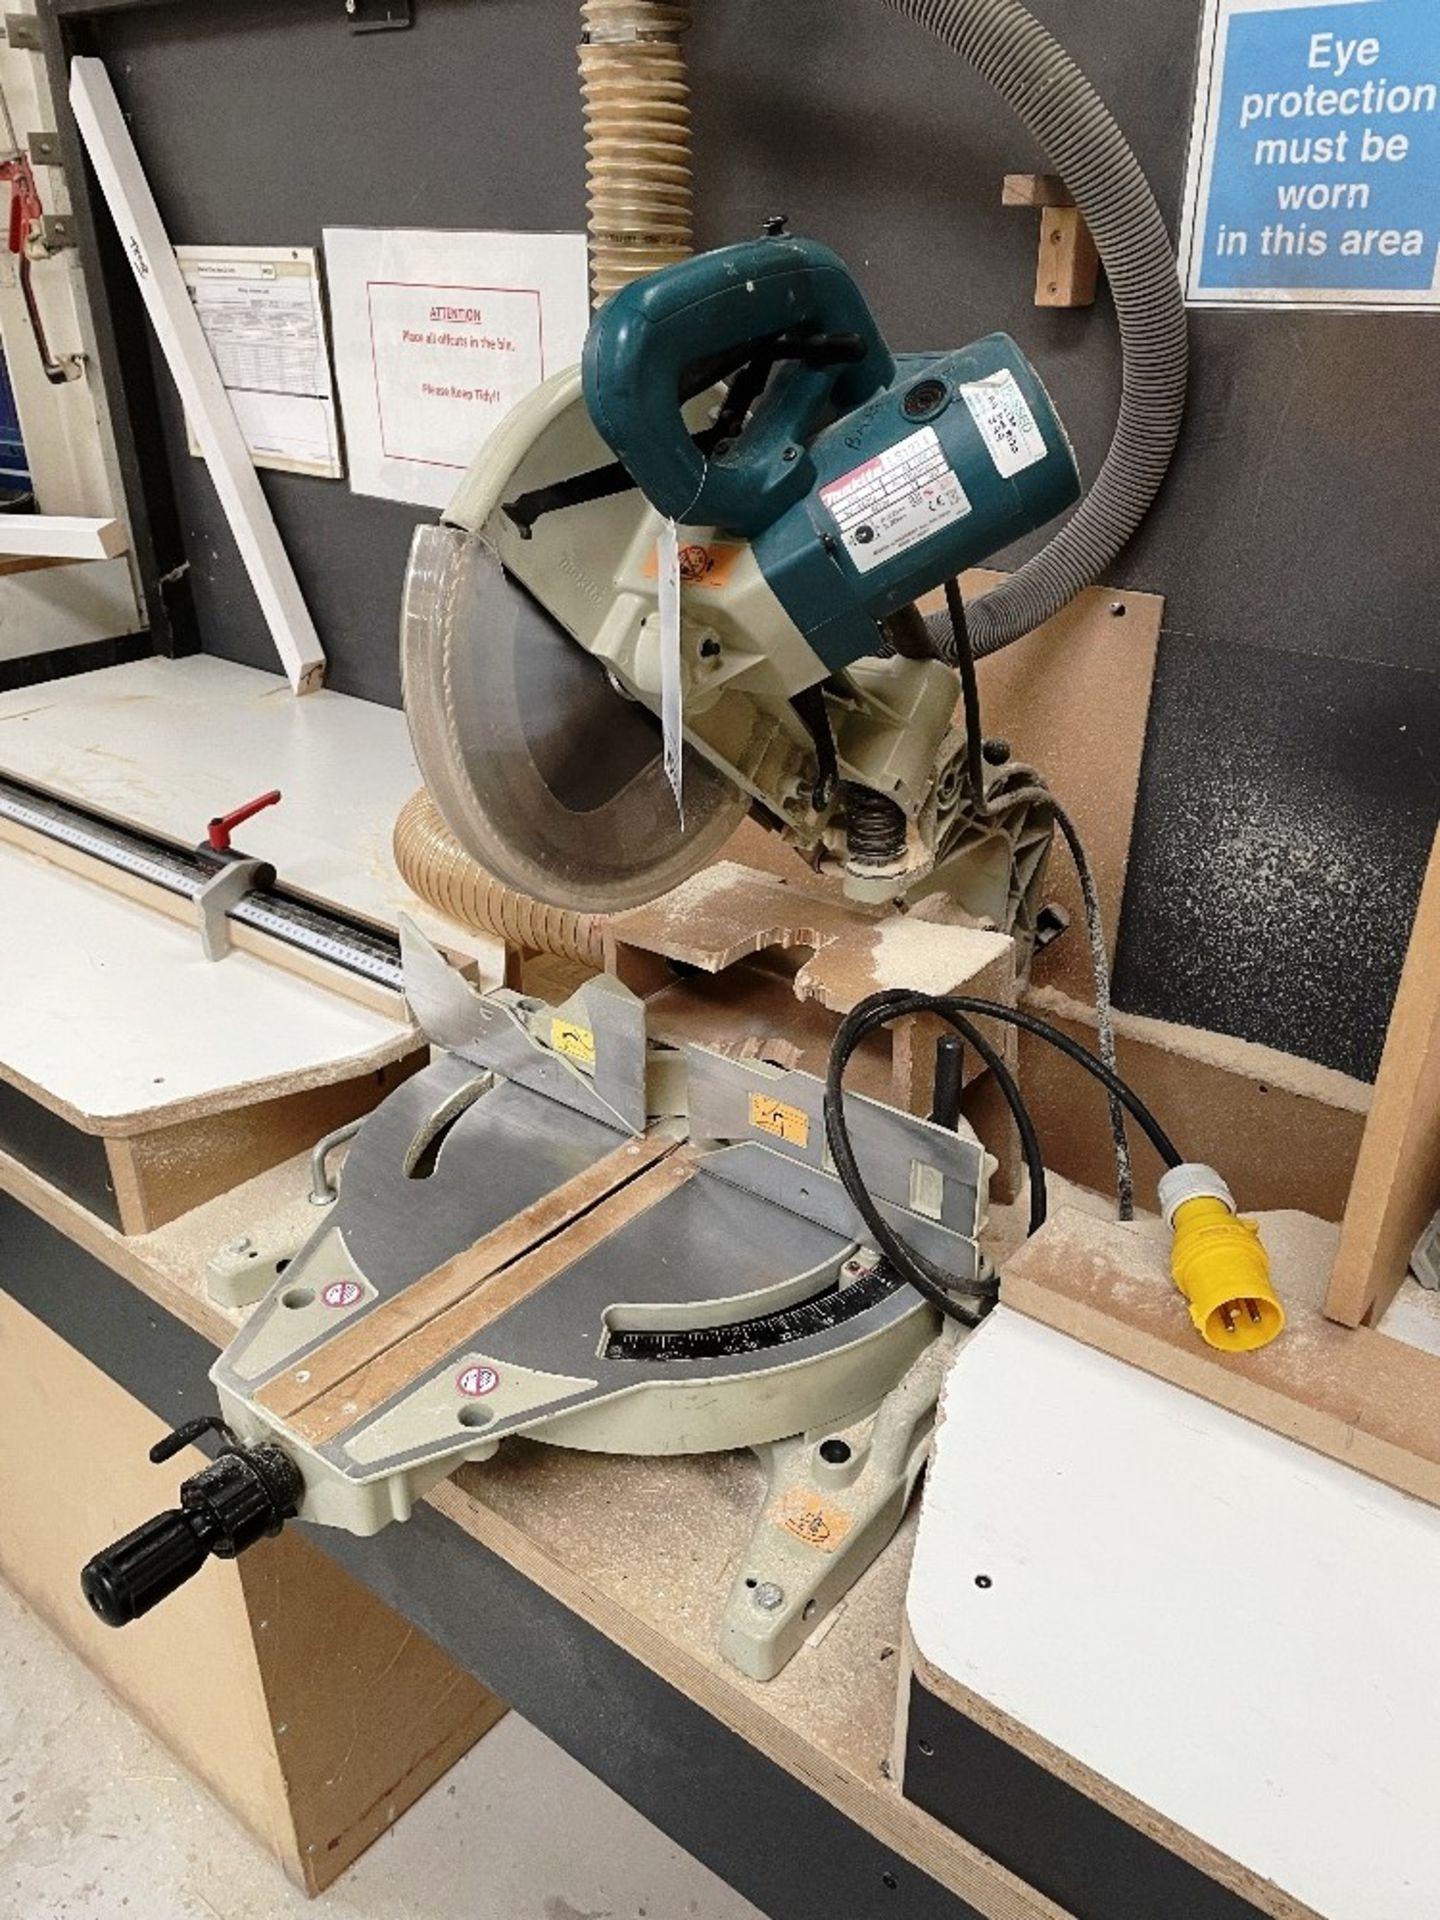 Makita LS1214 Corded 305mm Slide Compound Mitre Saw   110v - Image 3 of 6